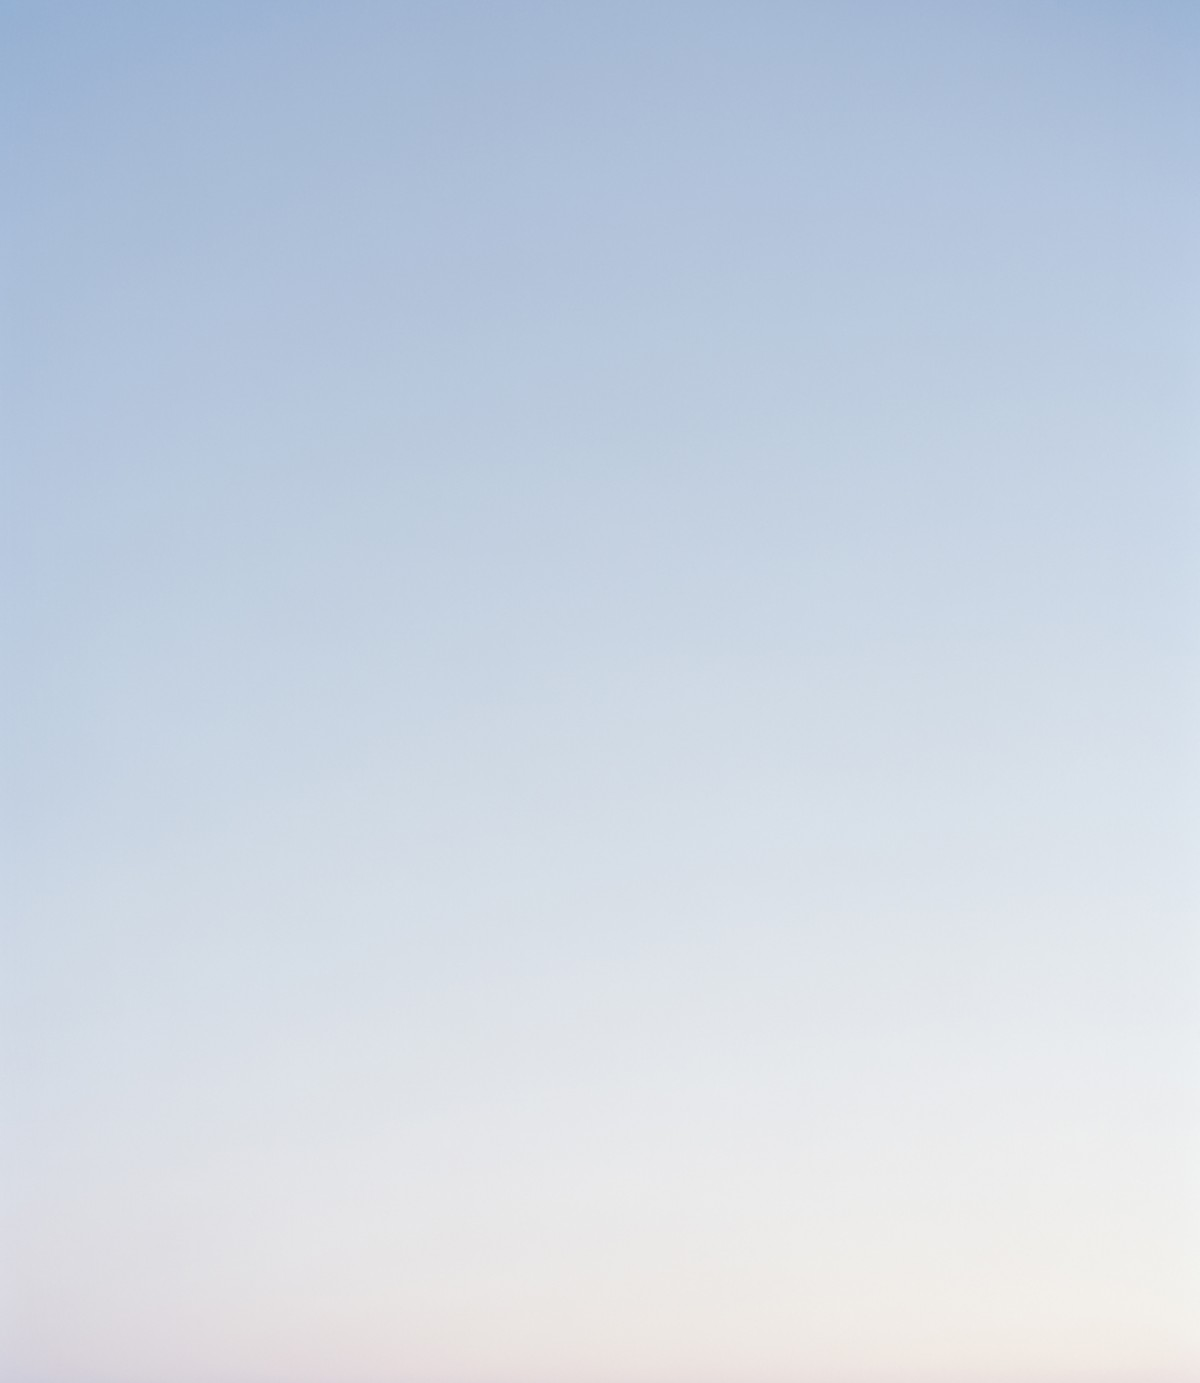 sky-ruby-stephan-e8fad630eb5cc8b608ab7793a61b022c